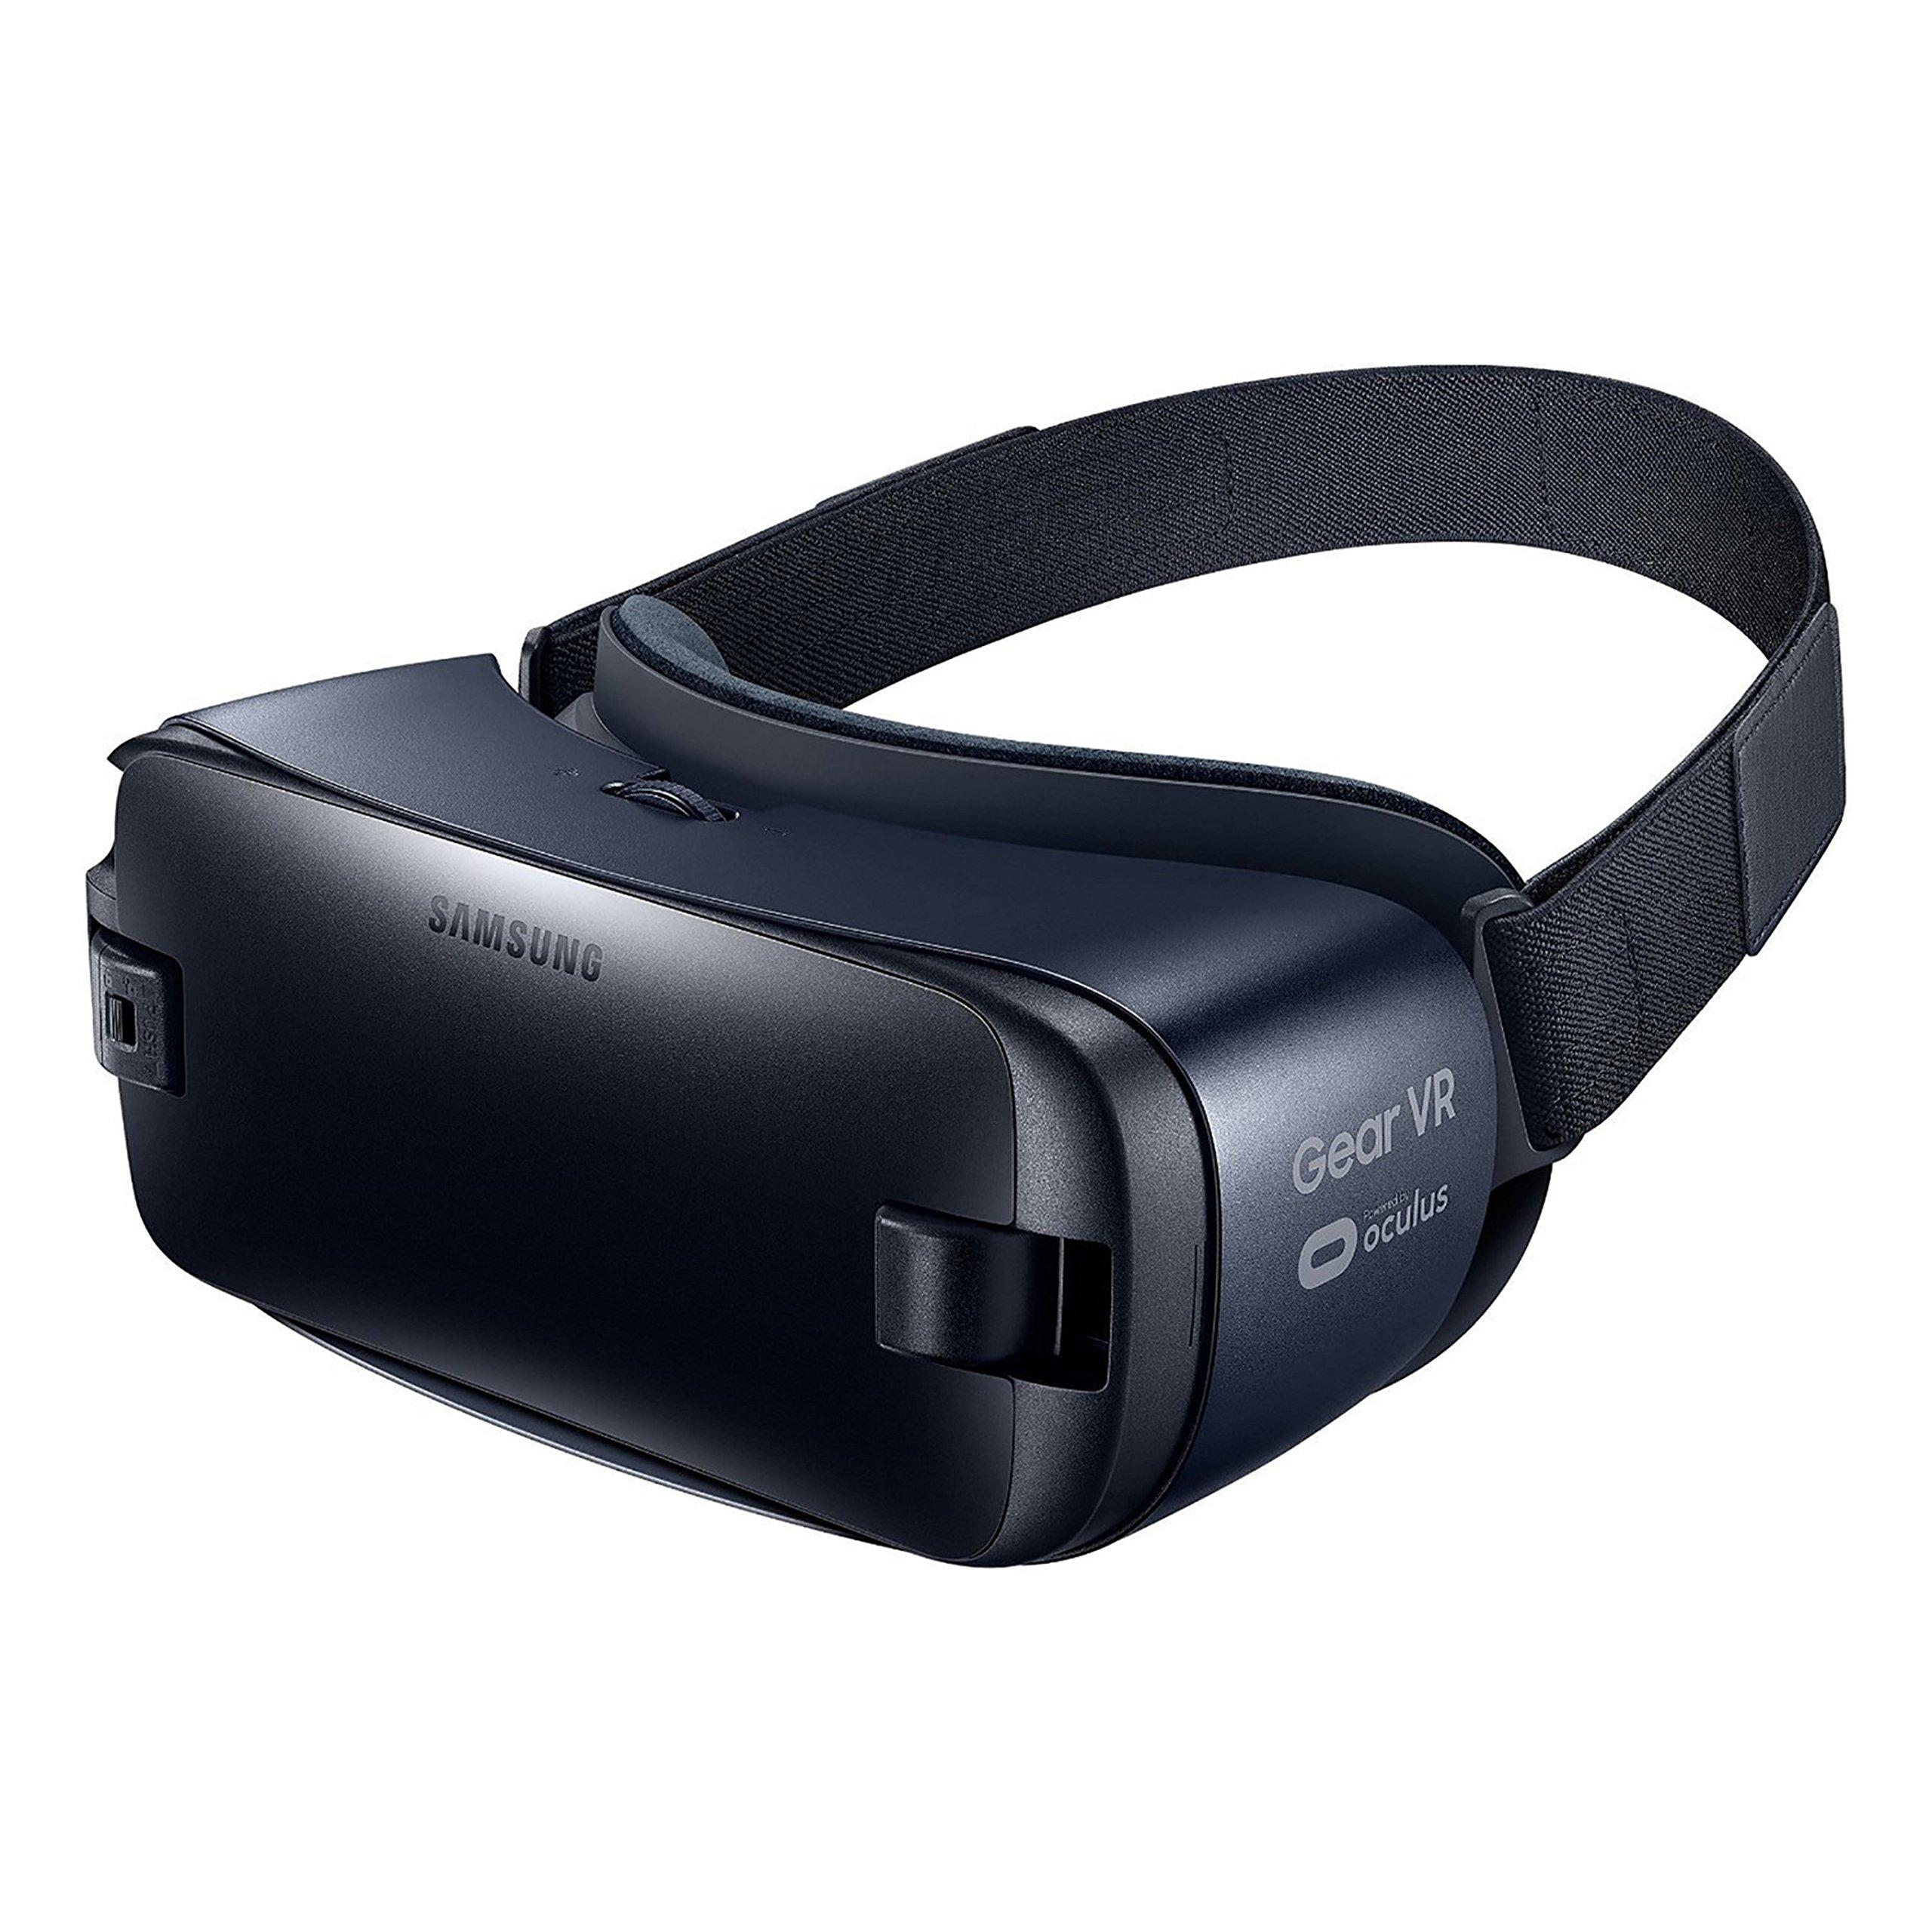 Samsung SM-R323NBKAXAR Gear Virtual Reality 2016 for Galaxy S7, Galaxy S7 edge, Galaxy Note5, Galaxy S6, Galaxy S6 edge, Galaxy S6 edge+ (International Version, No Warranty) - Black by Samsung